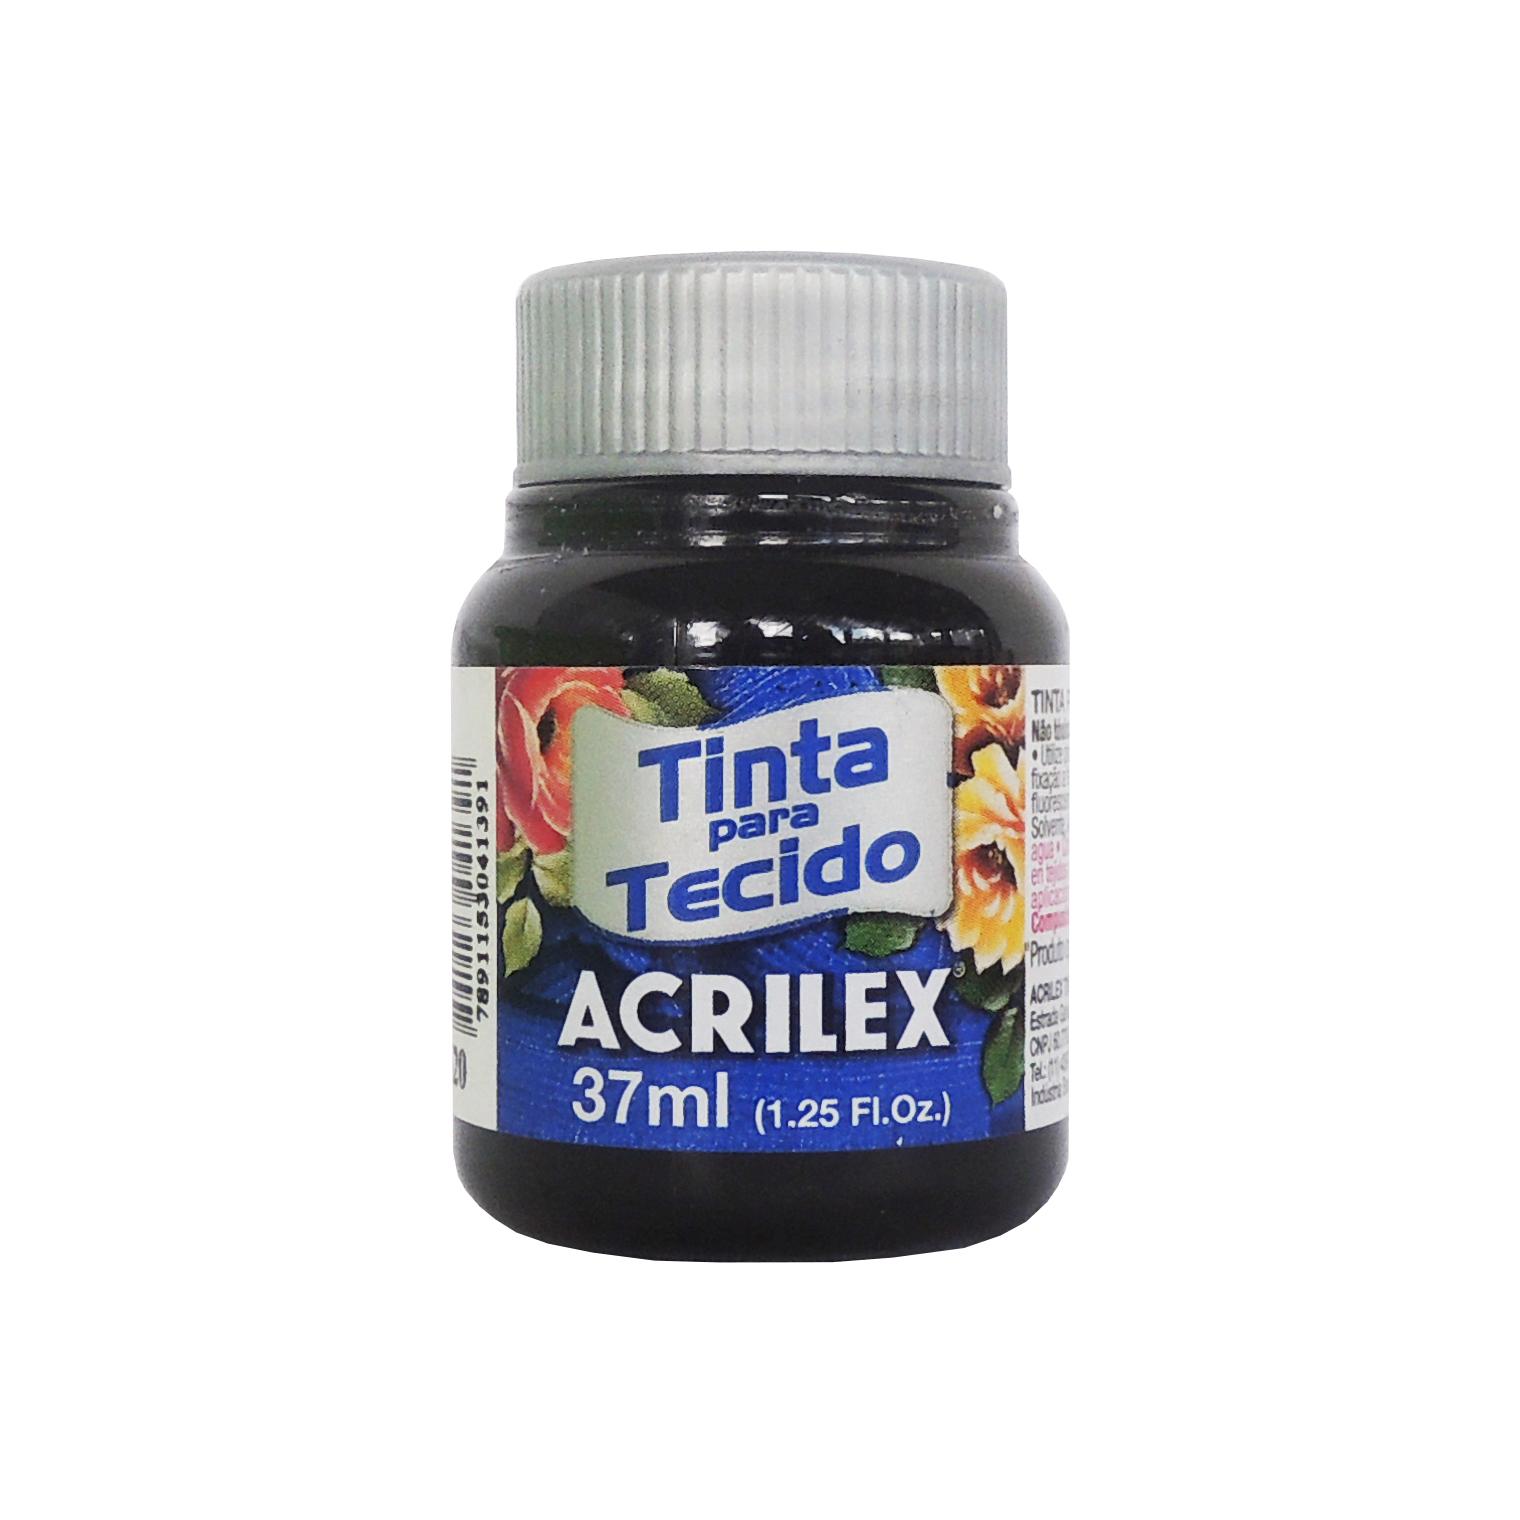 tinta-para-tecido-acrilex-37ml-520-preto